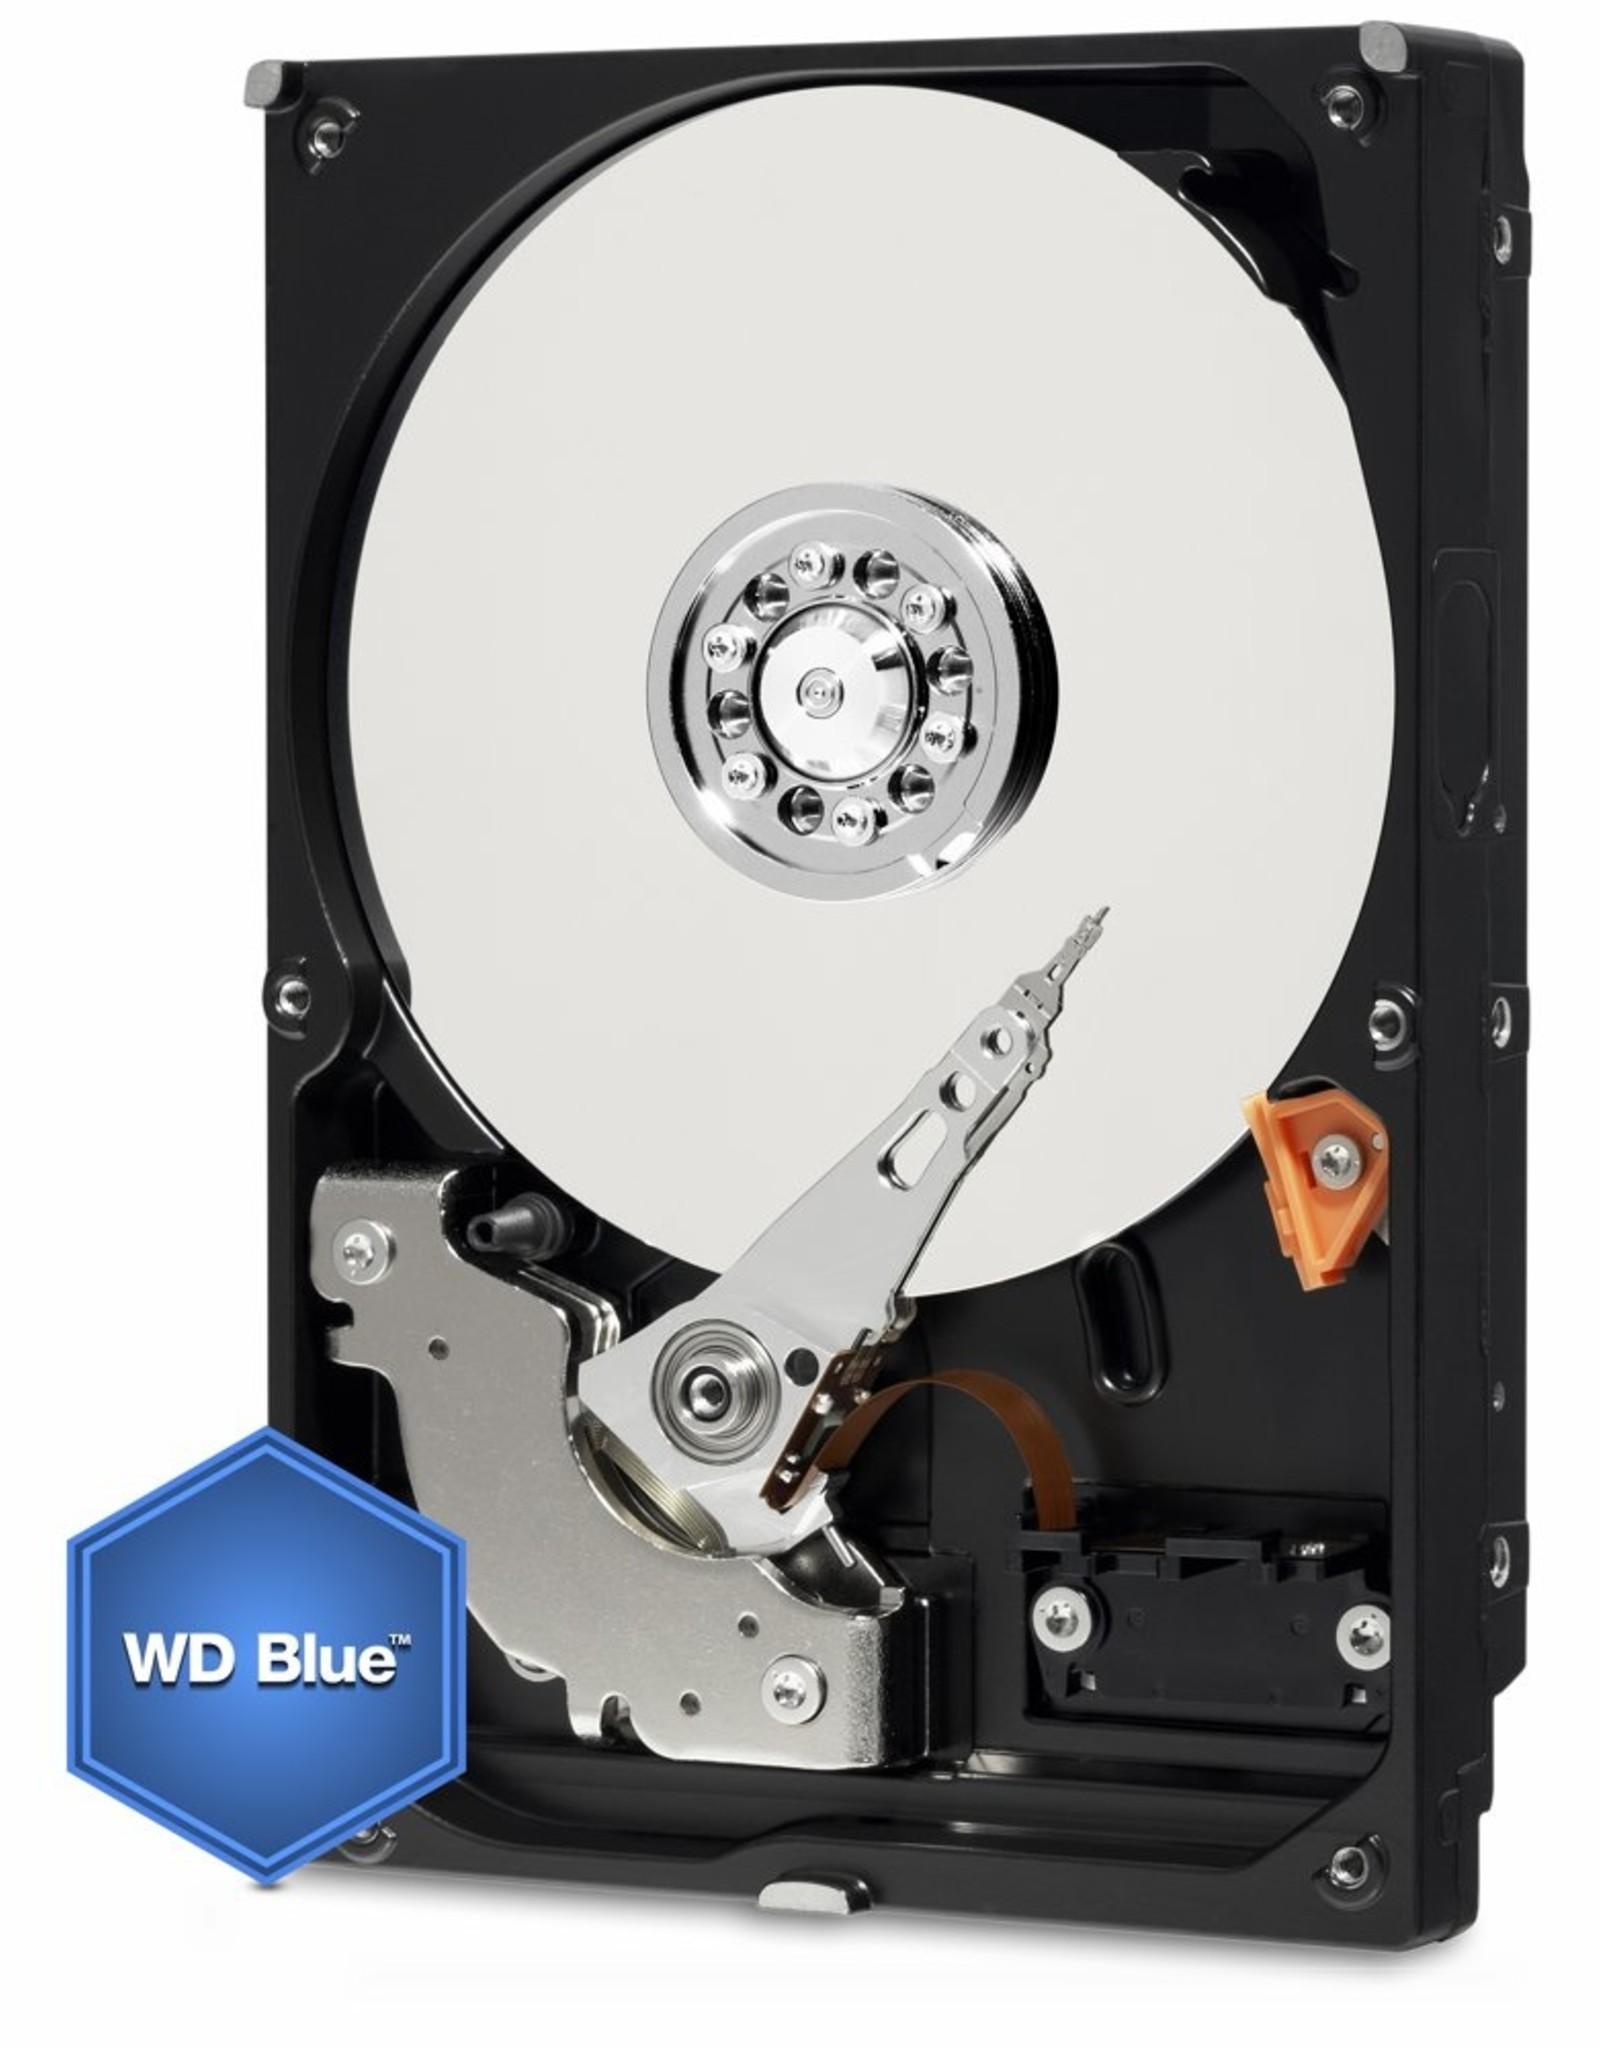 HDD WD Blue™ 2TB IntelliPower - 64MB - SATA3 3.5inch